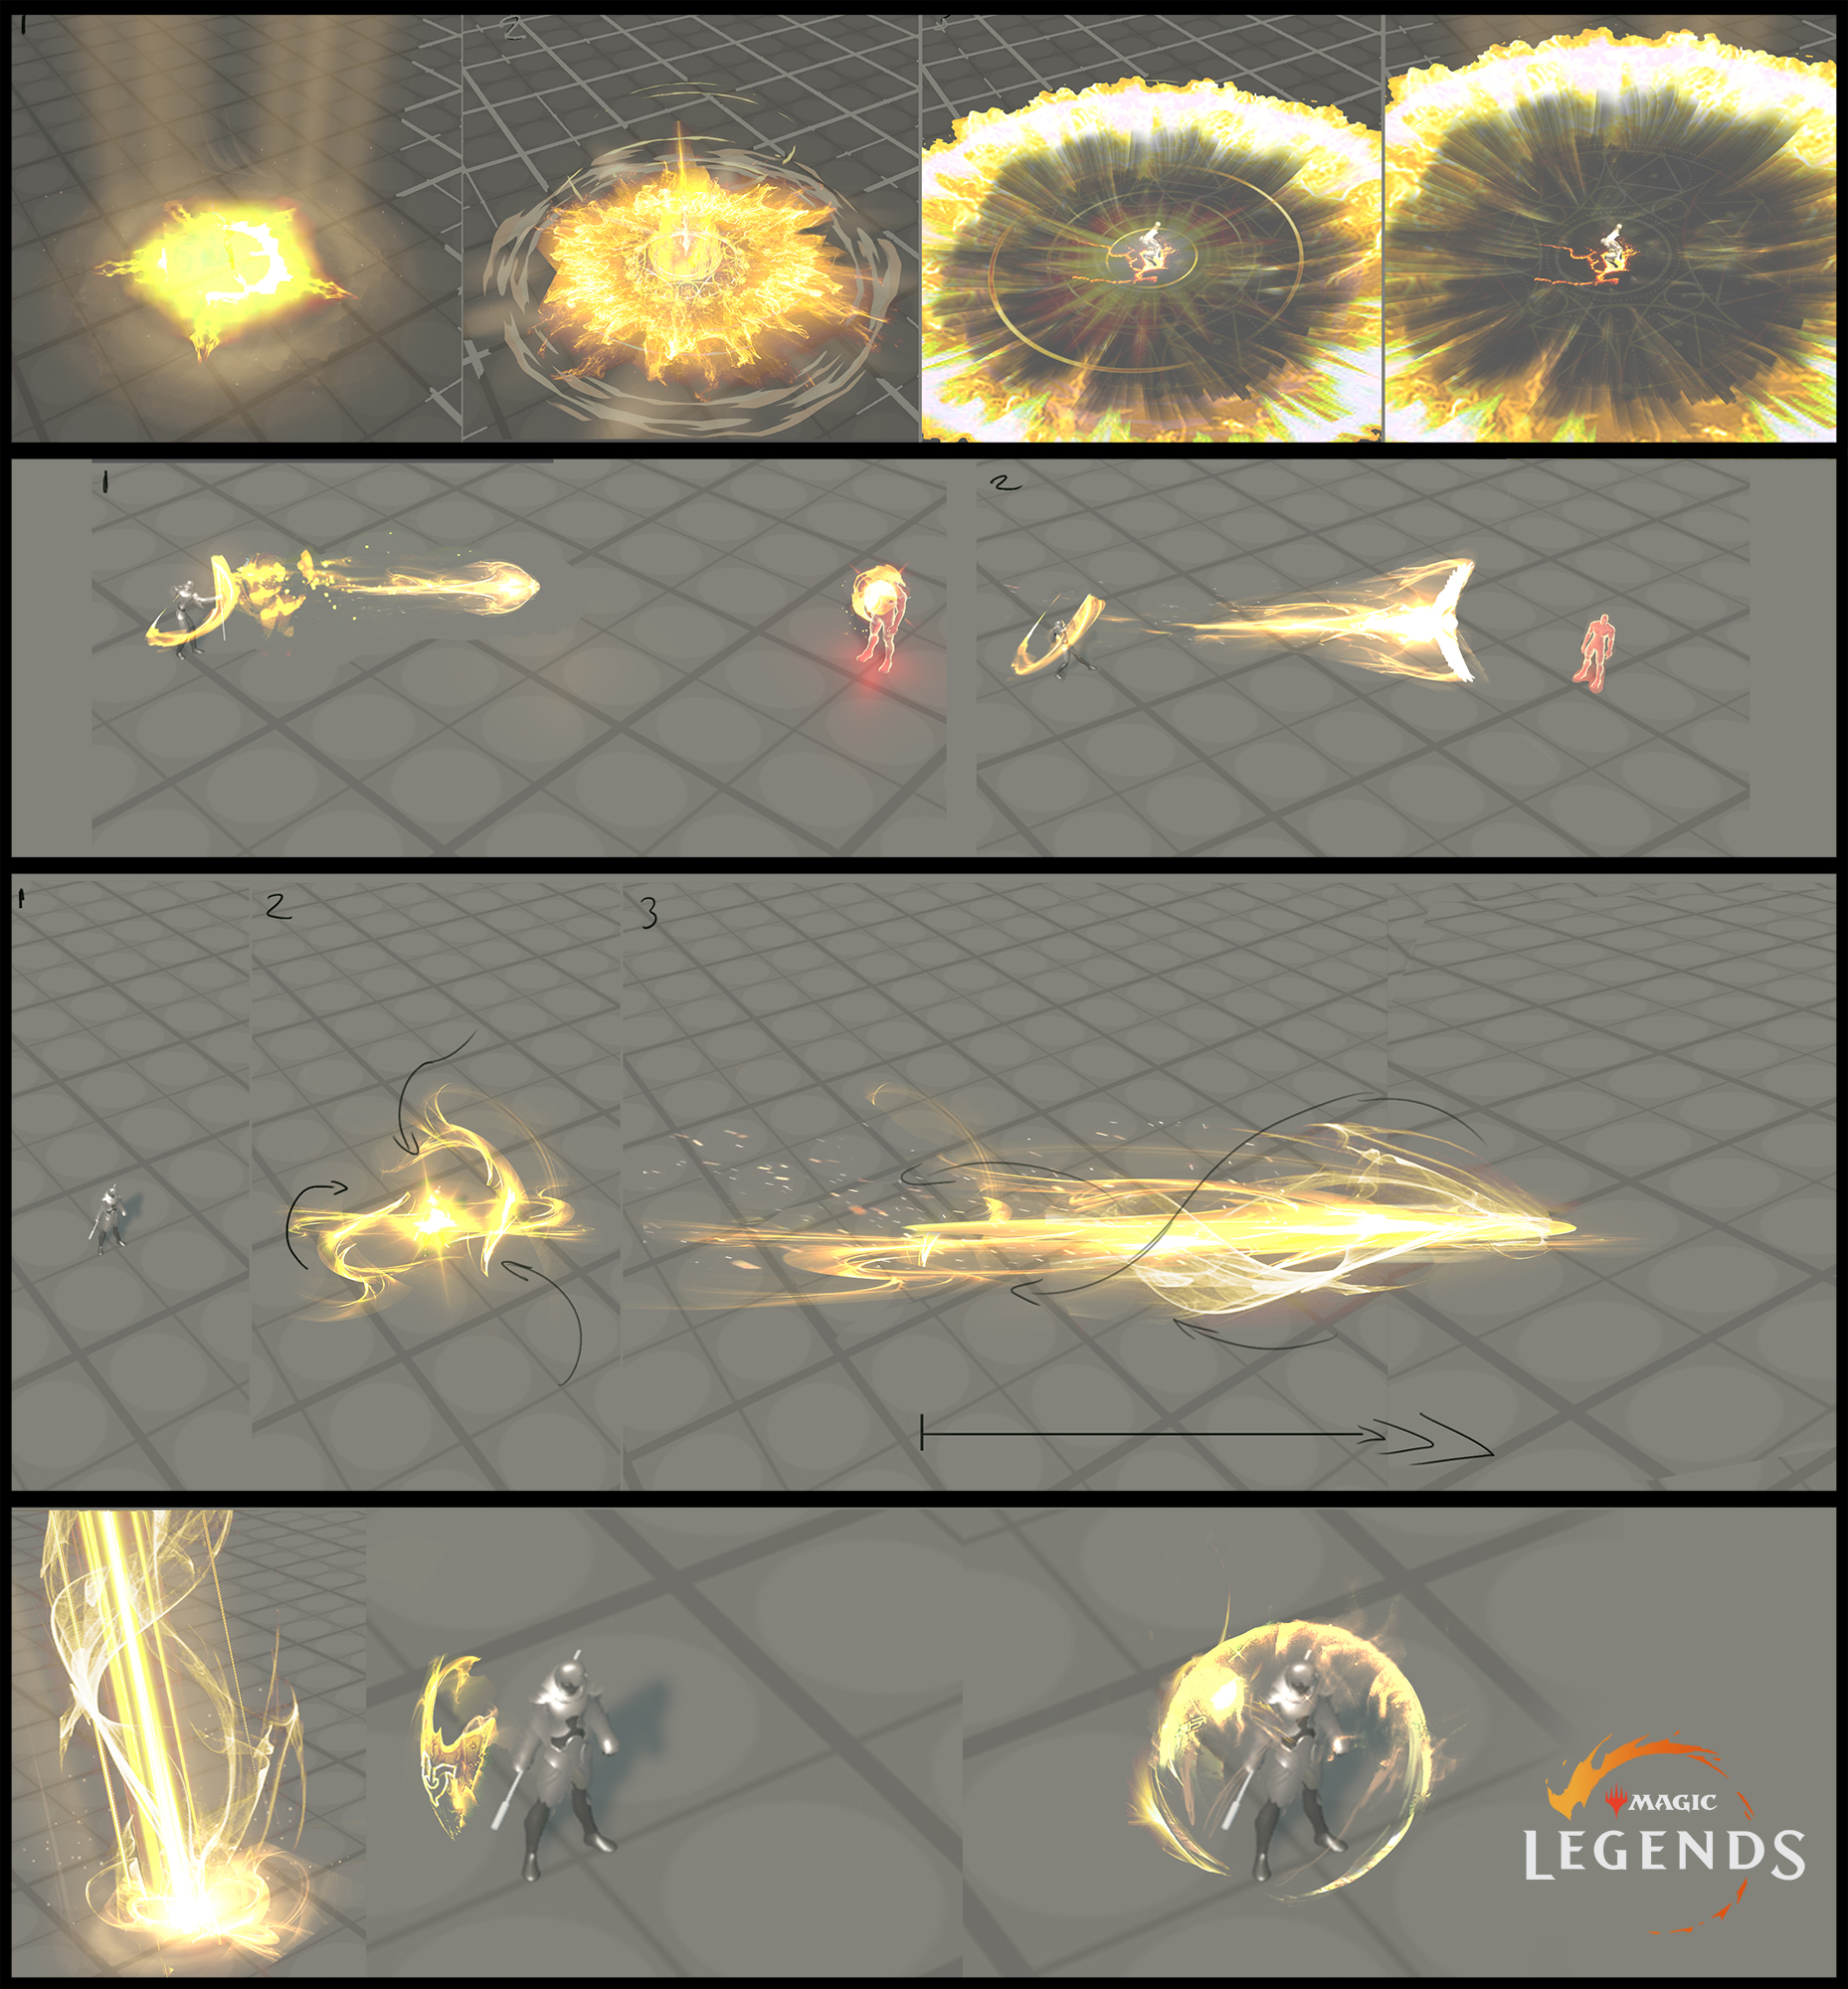 Magic-Legends_2020_07-30-20_002